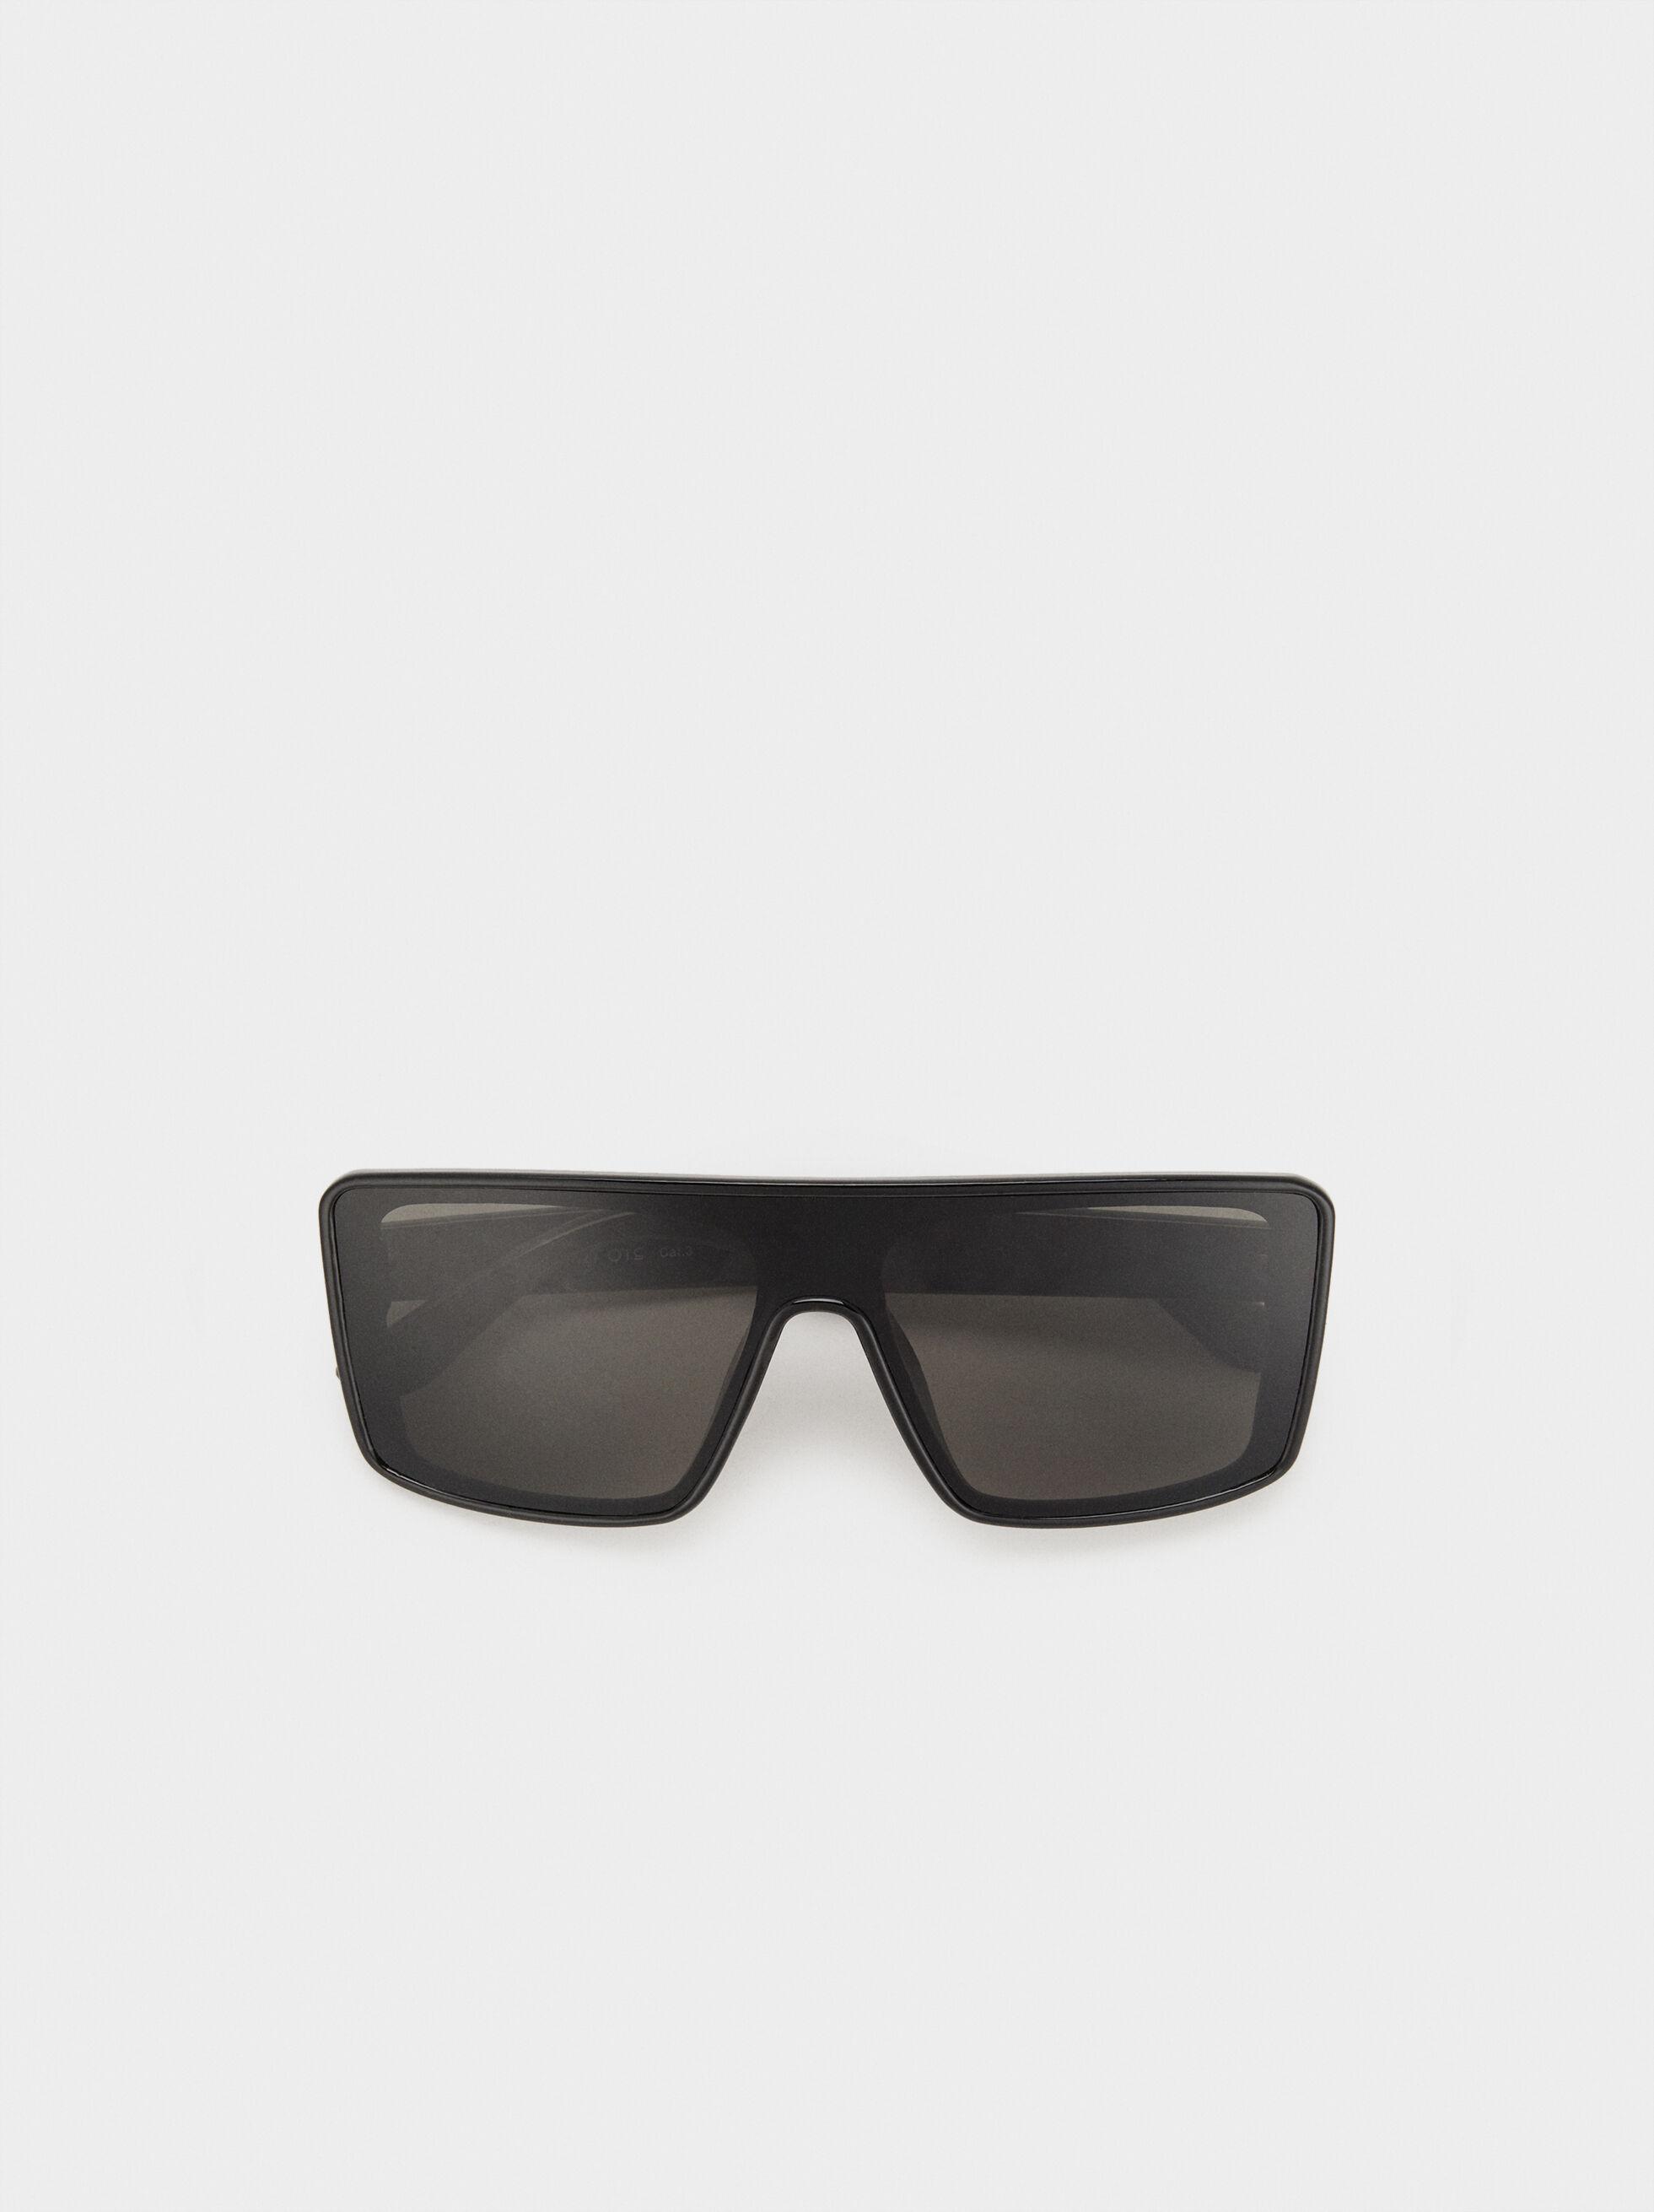 Square-Cut Sunglasses, , hi-res